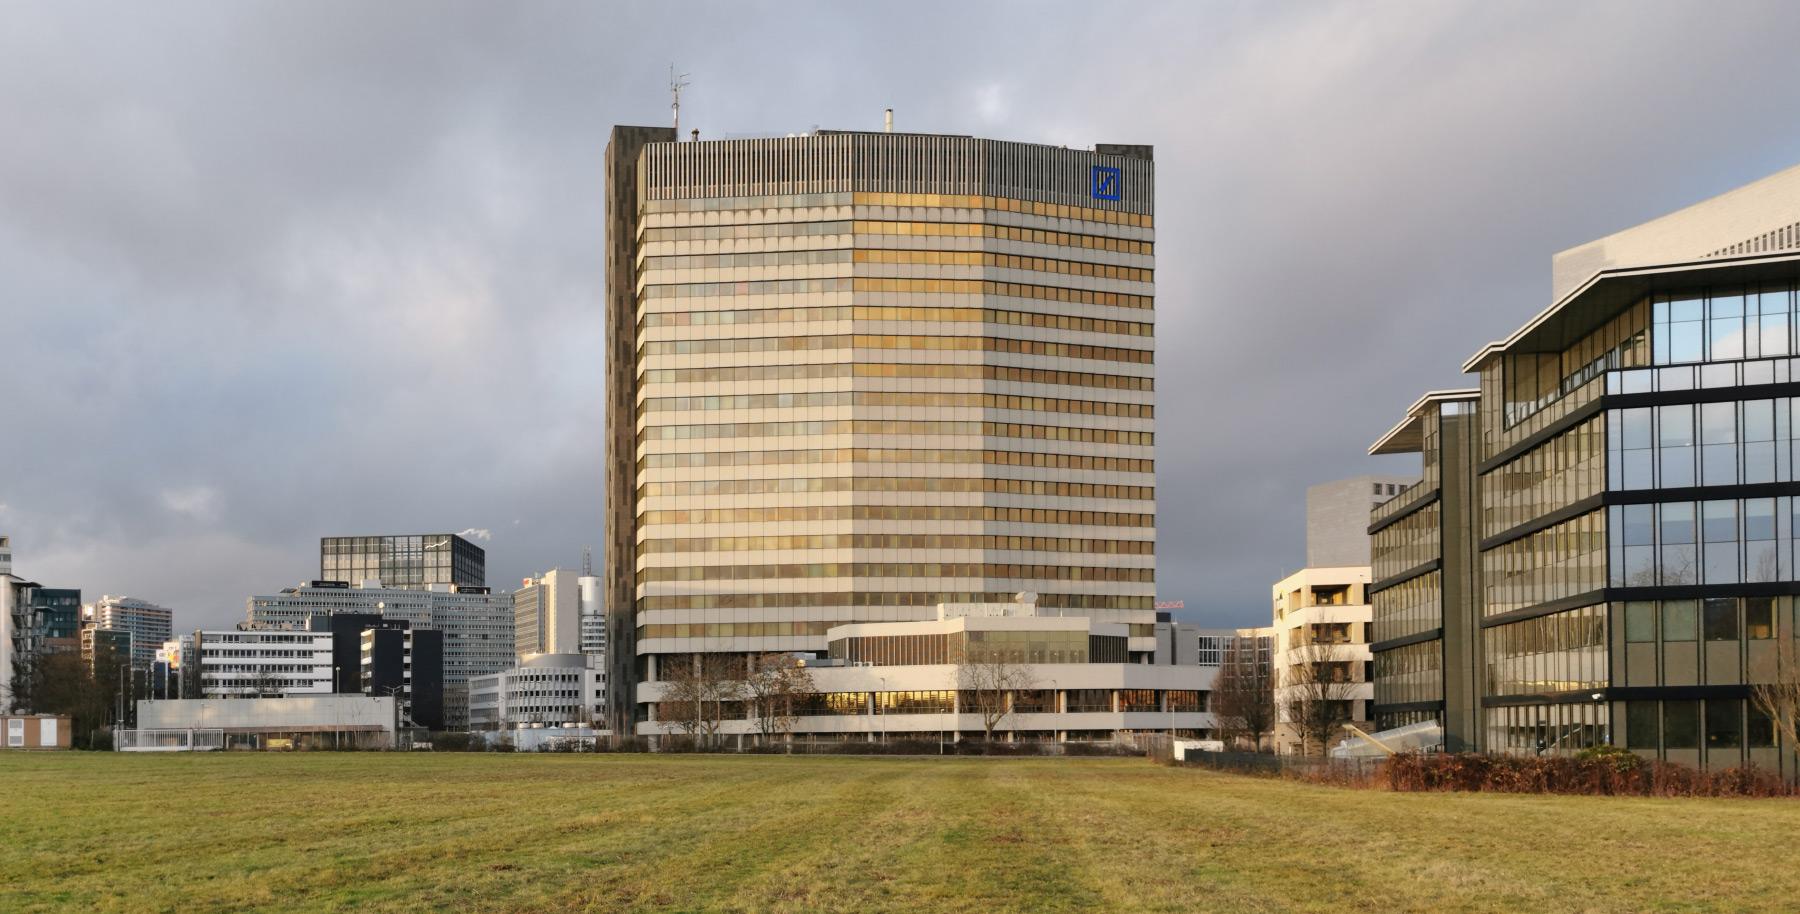 TZE - Technisches Zentrum Eschborn - Deutsche Bank Eschborn - Gewerbegebiet Süd Deutsche Bank AG